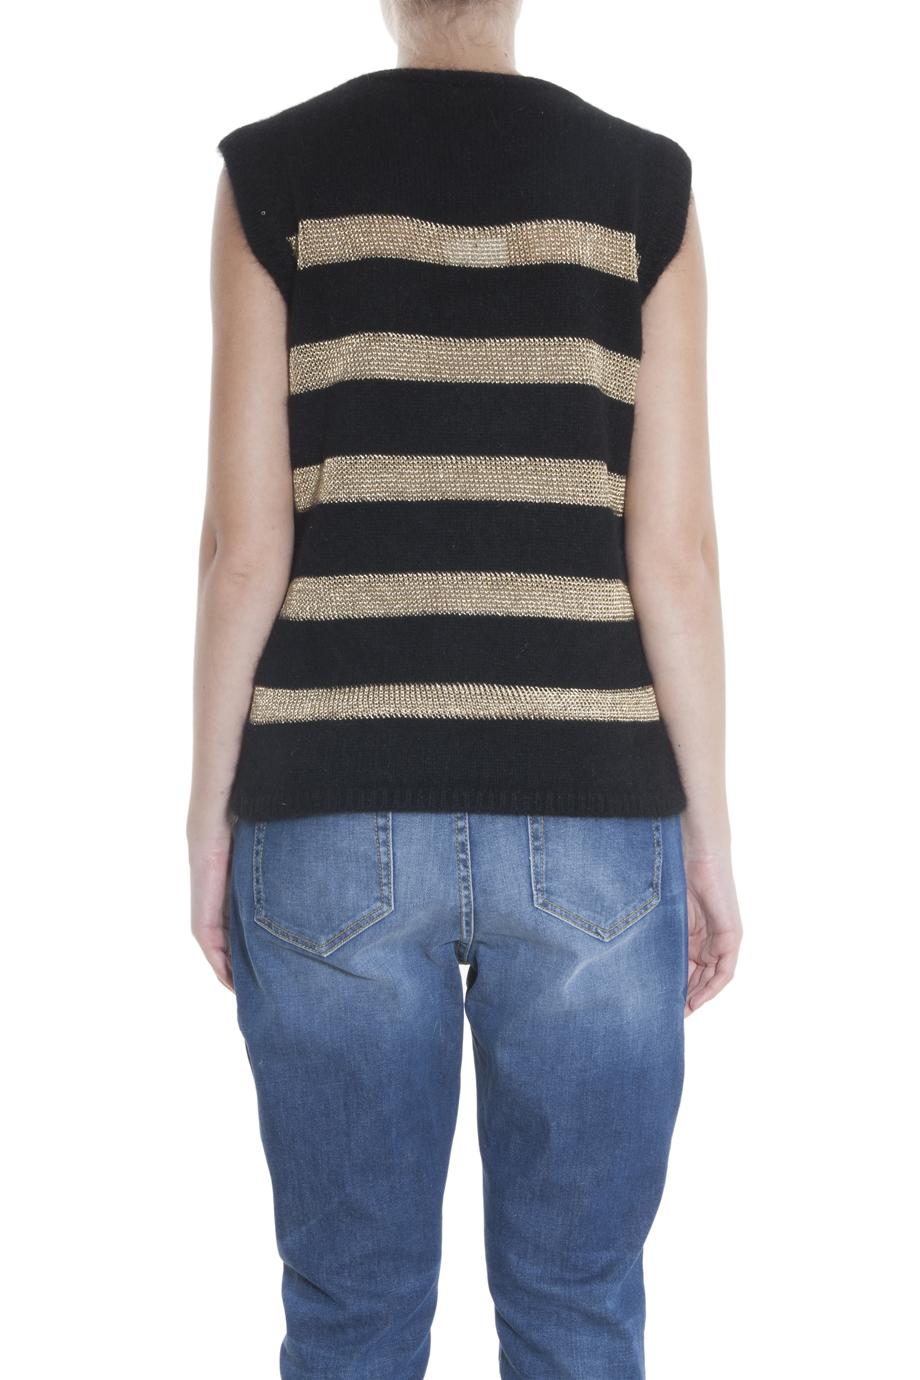 lyst paul joe mohair sweater in black. Black Bedroom Furniture Sets. Home Design Ideas